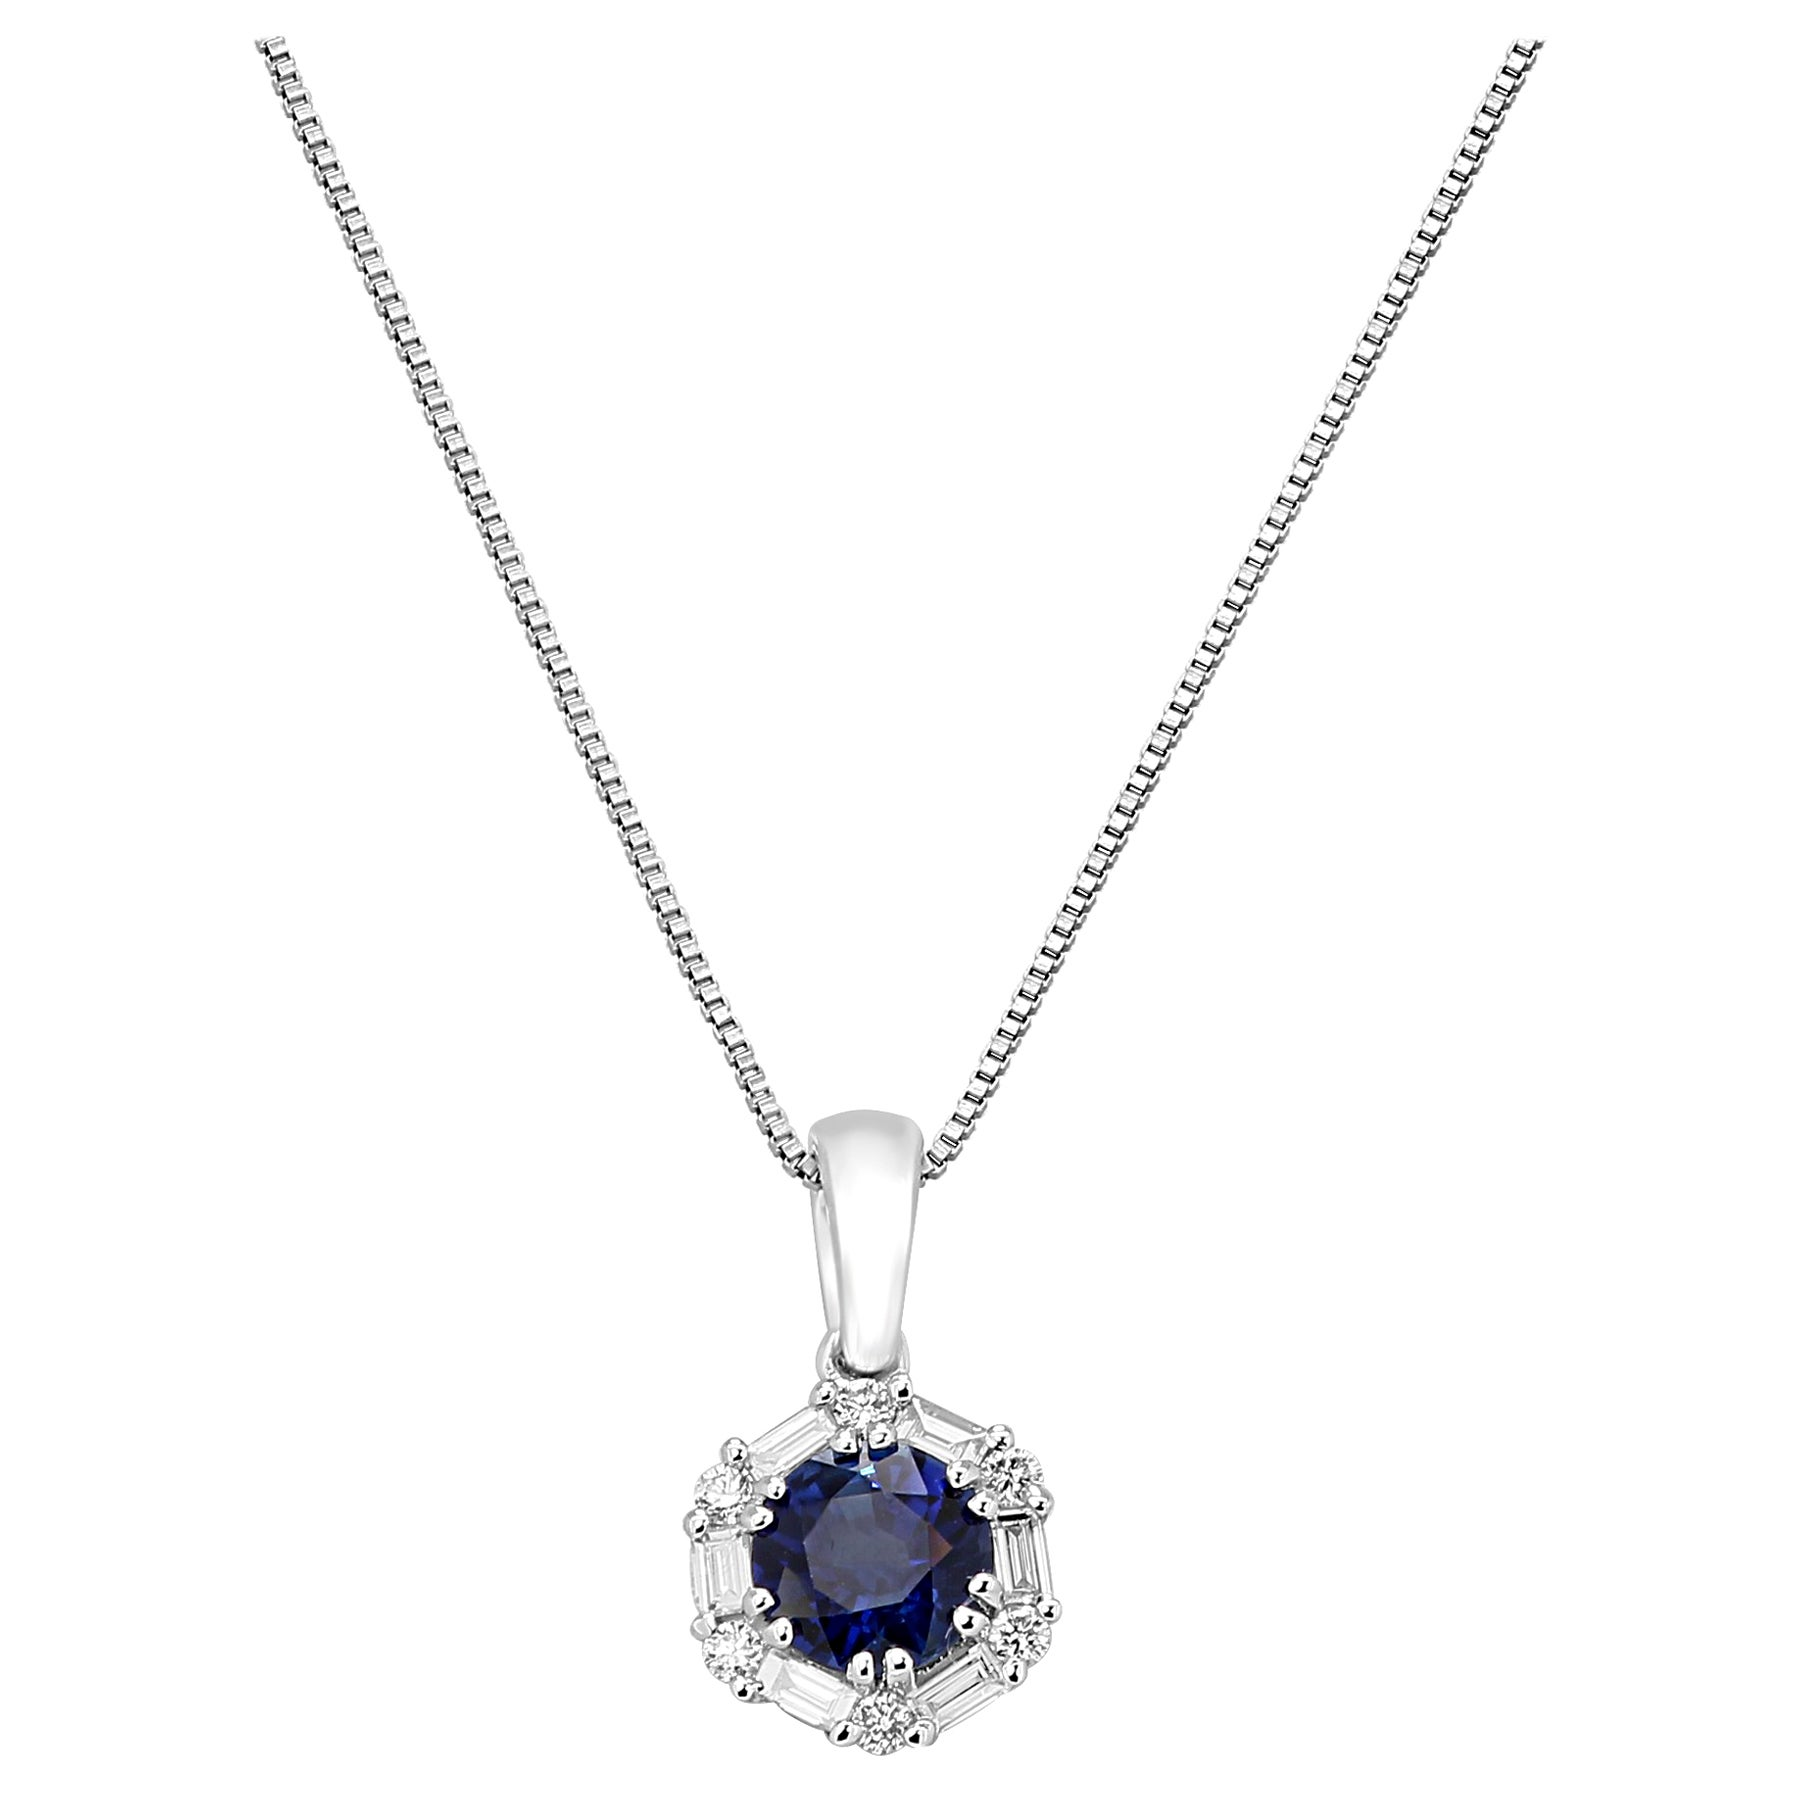 Blue Sapphire Diamond Halo Gold Drop Pendant Chain Necklace